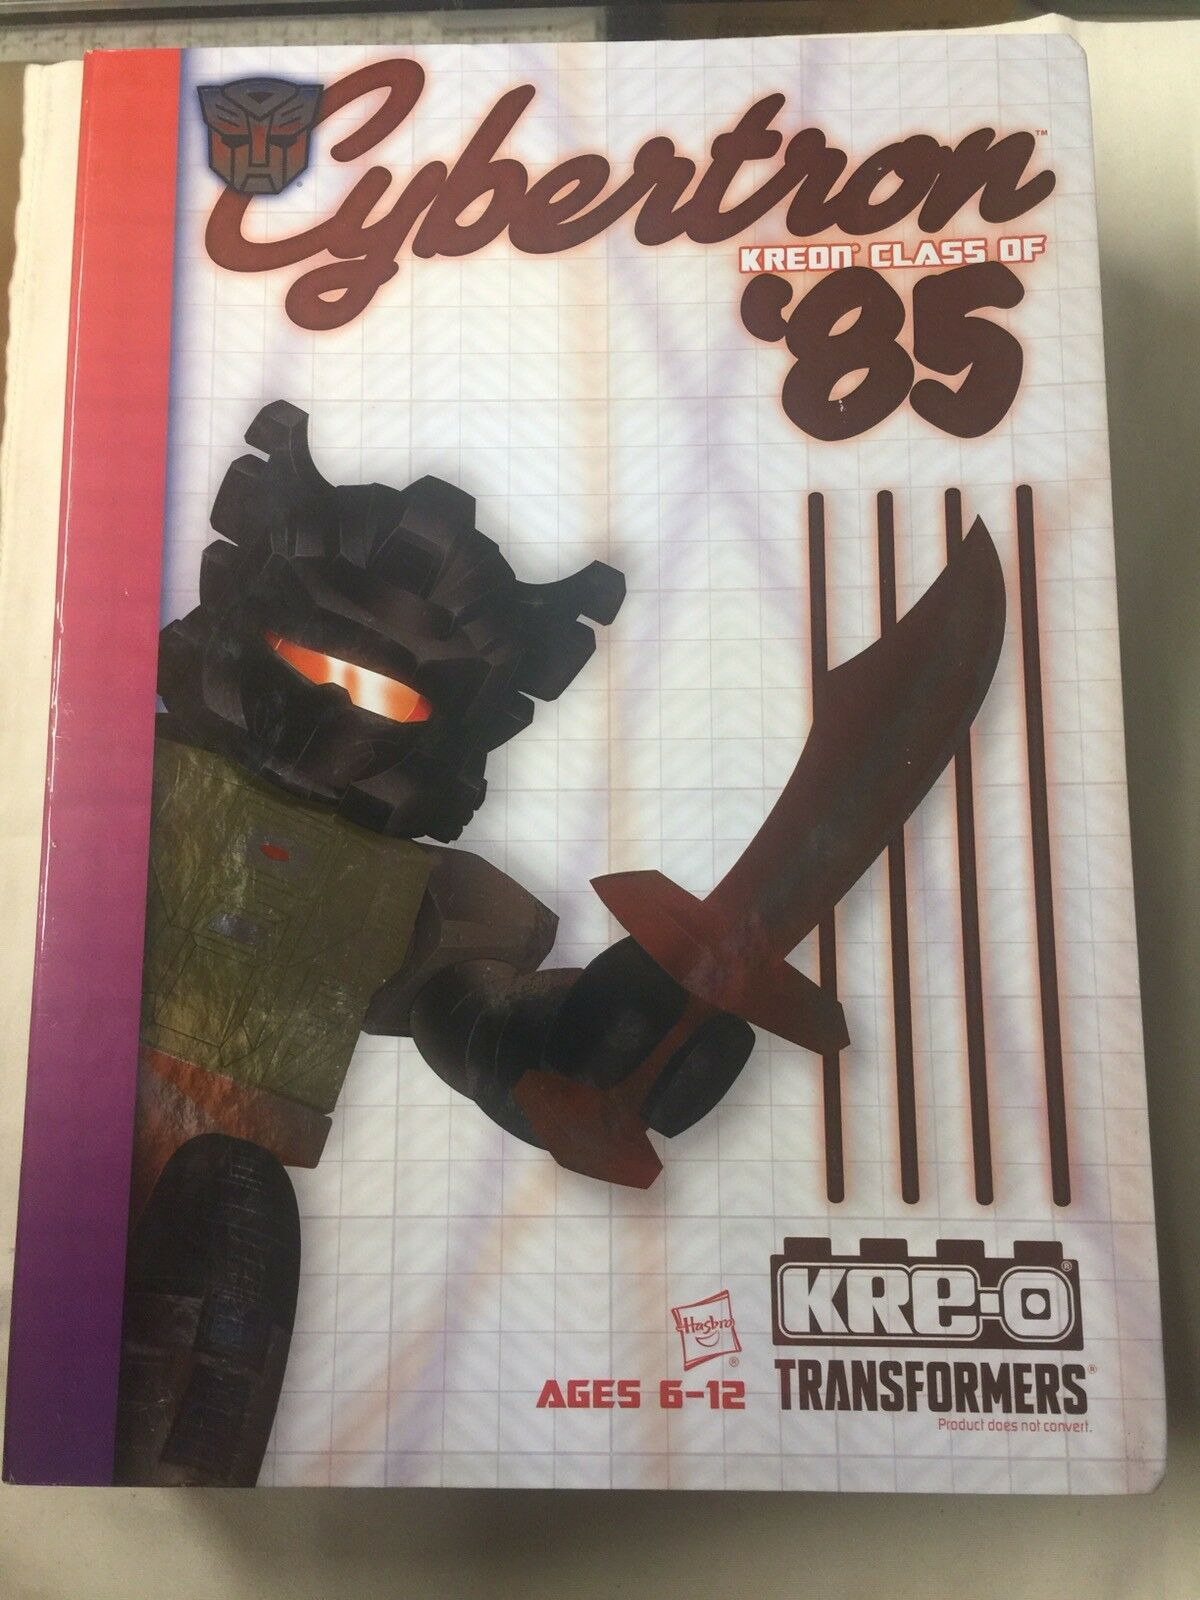 Hasbro sdcc exklusive kreo-o transformatoren cybertron klasse von 1985 neue kreo